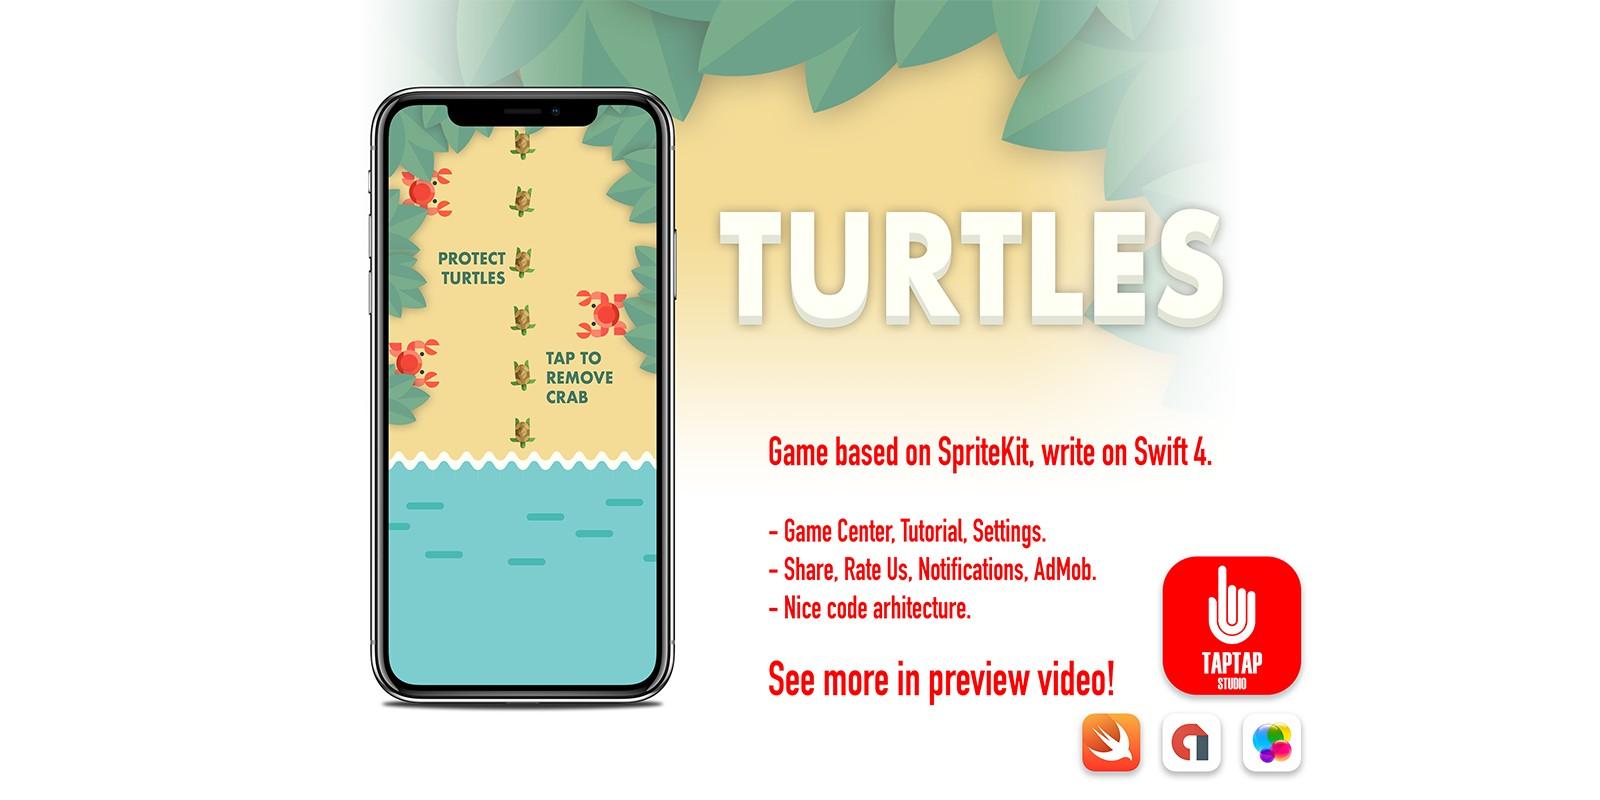 Turtles - iOS Game Source Code